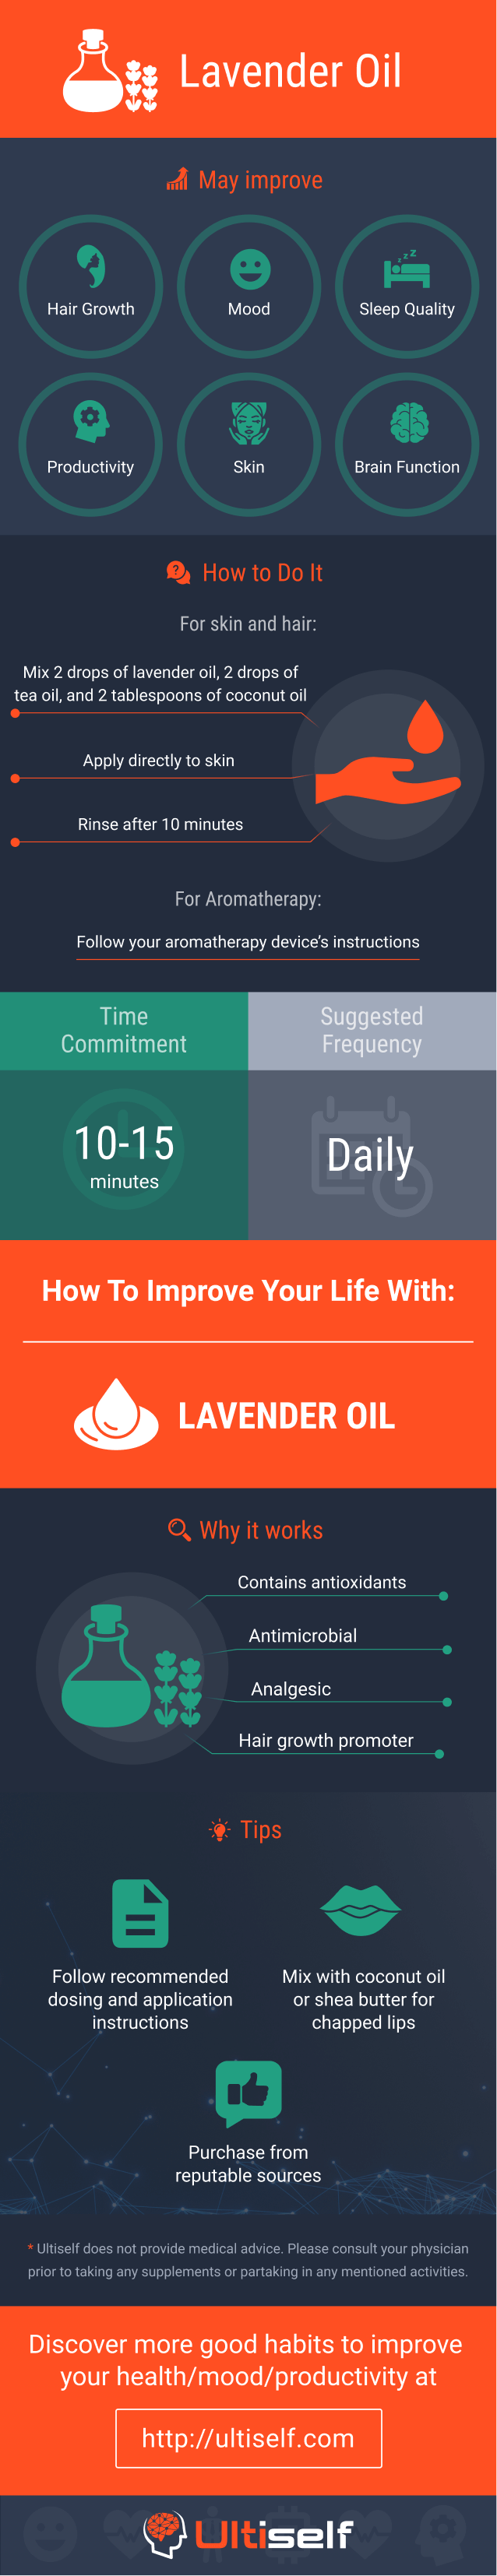 Lavender Oil infographic